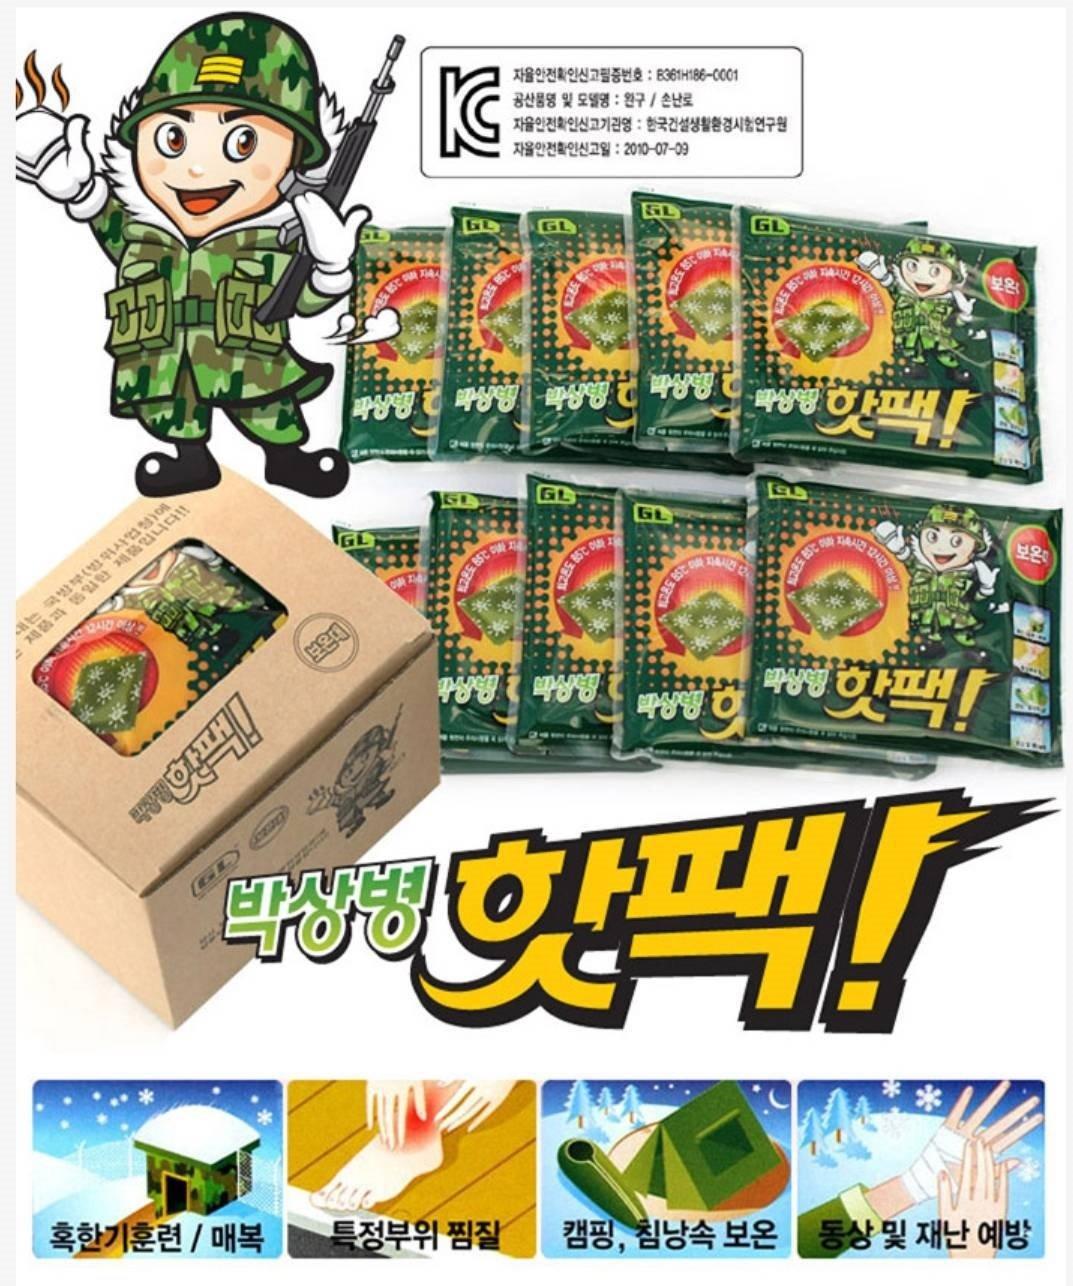 《FLYFISH》韓國 GL軍人暖暖包 超強可熱兩天 暖暖包